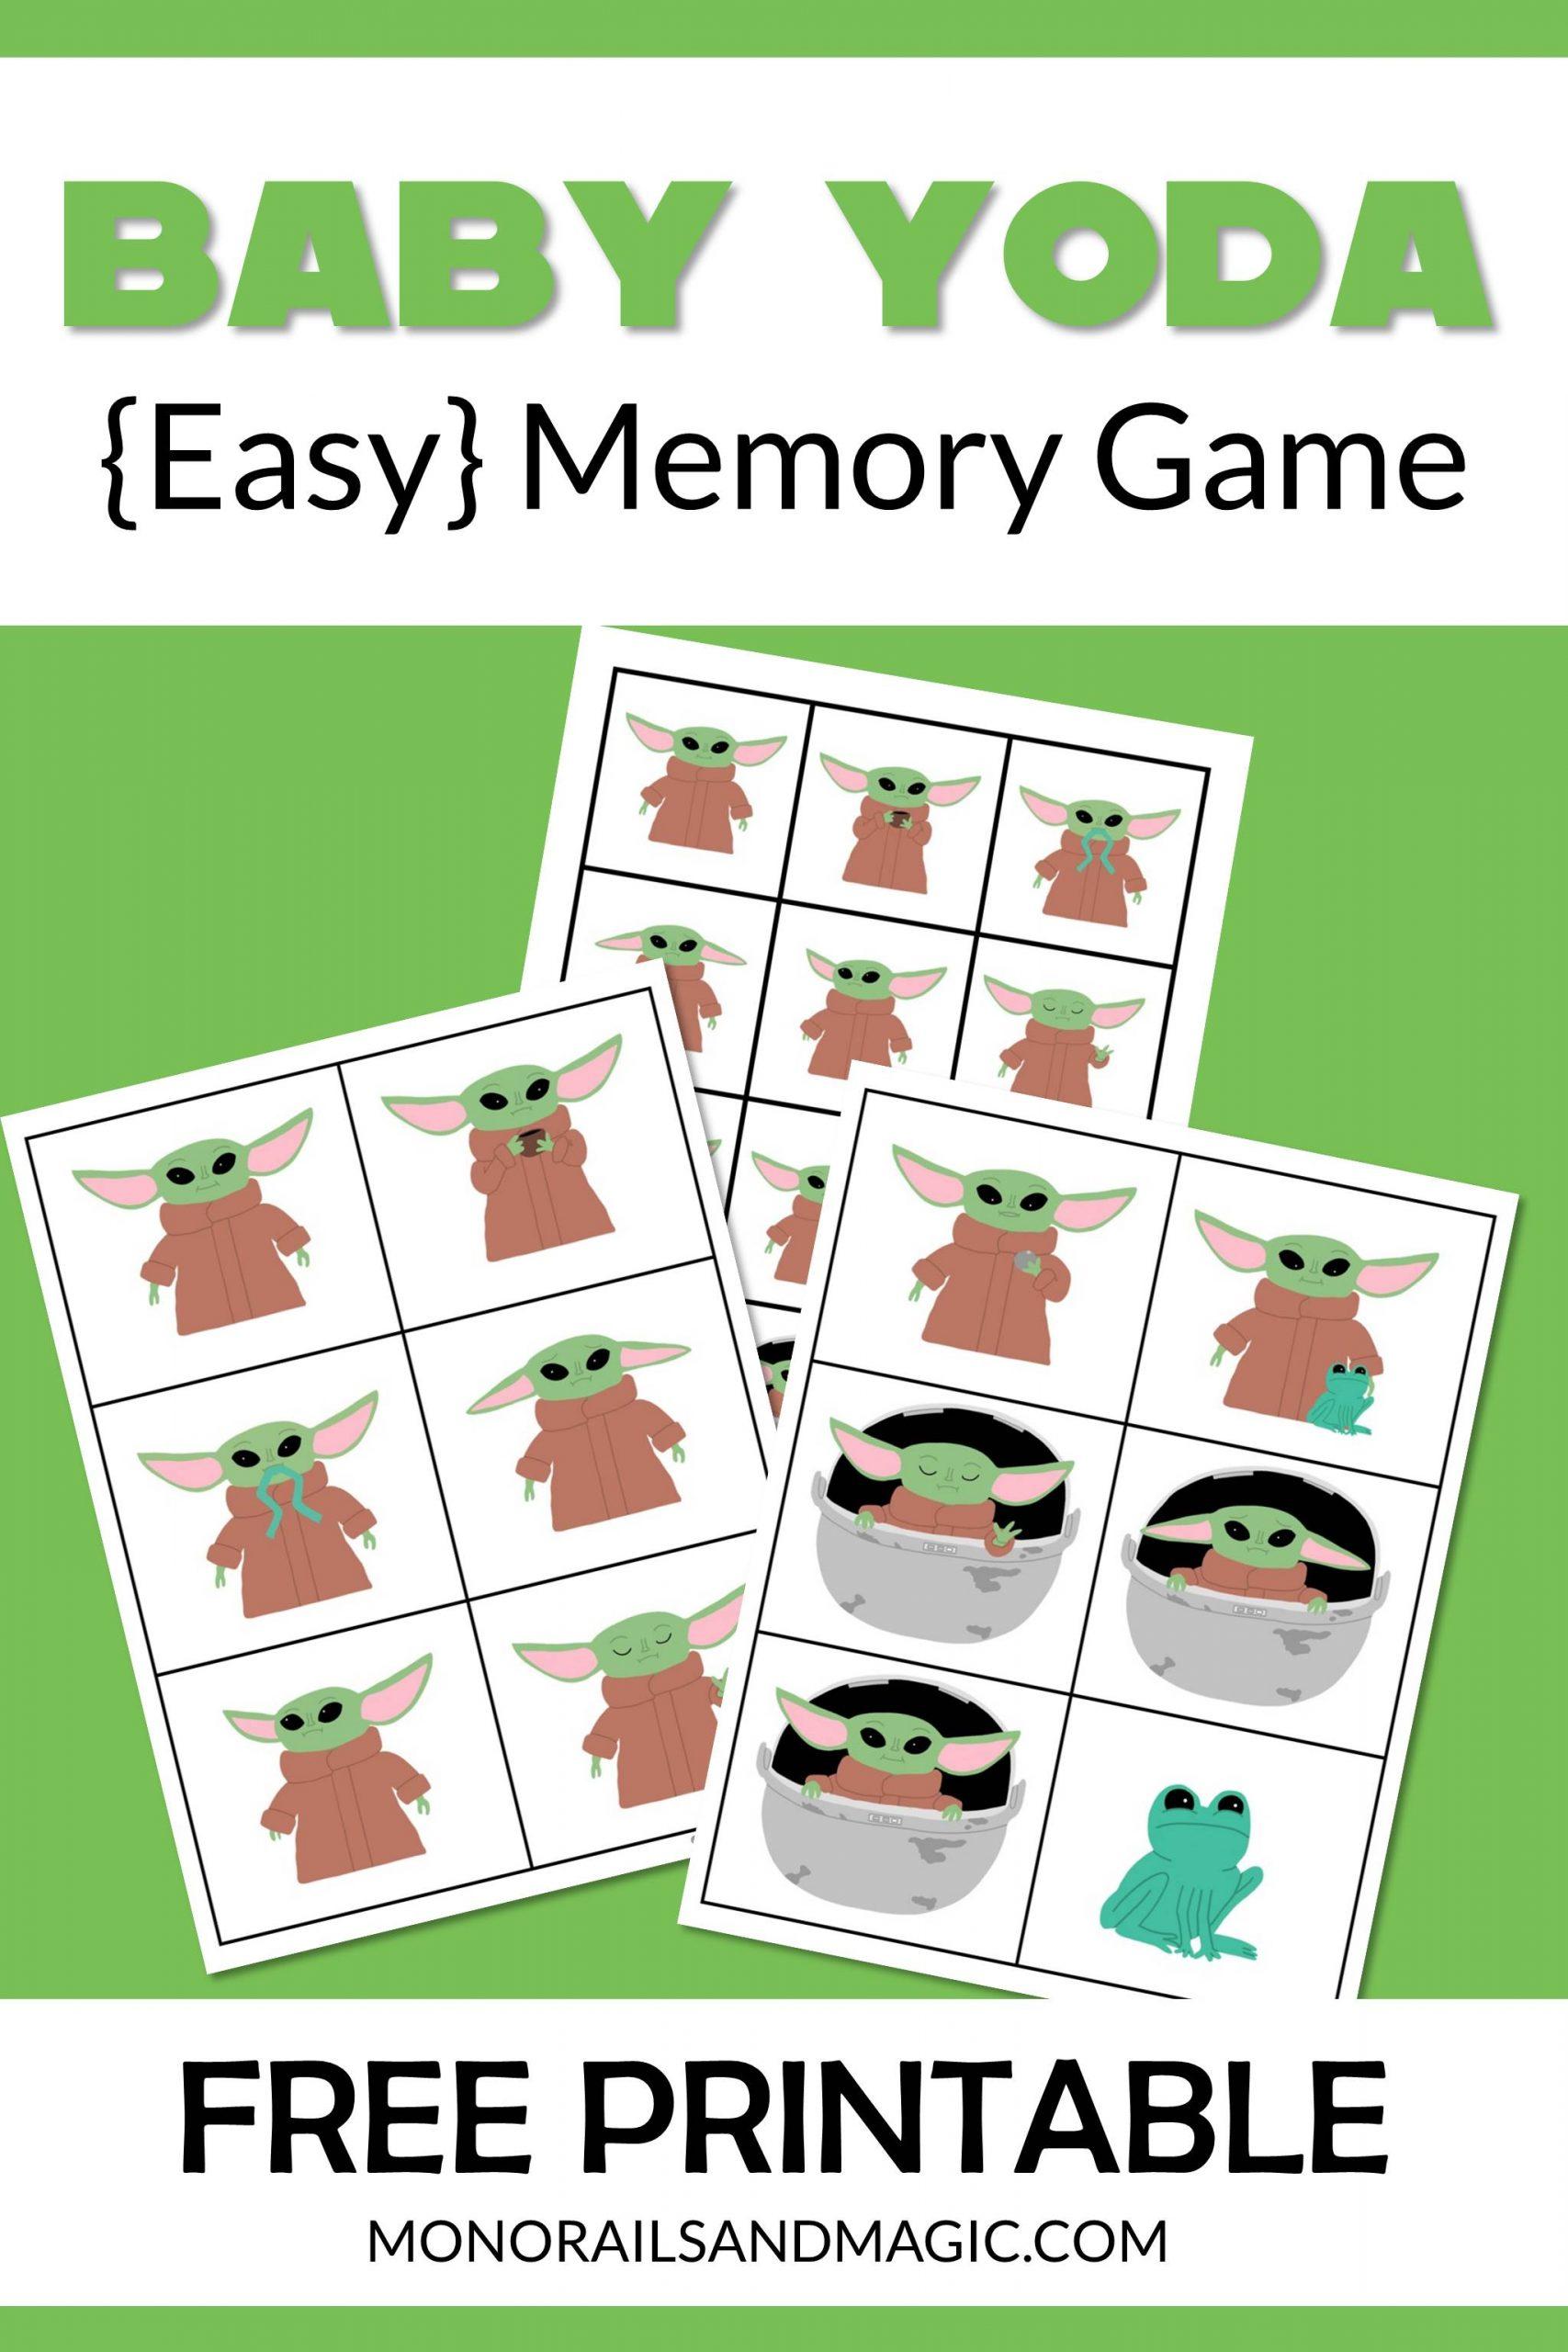 Free printable Baby Yoda memory game for kids.